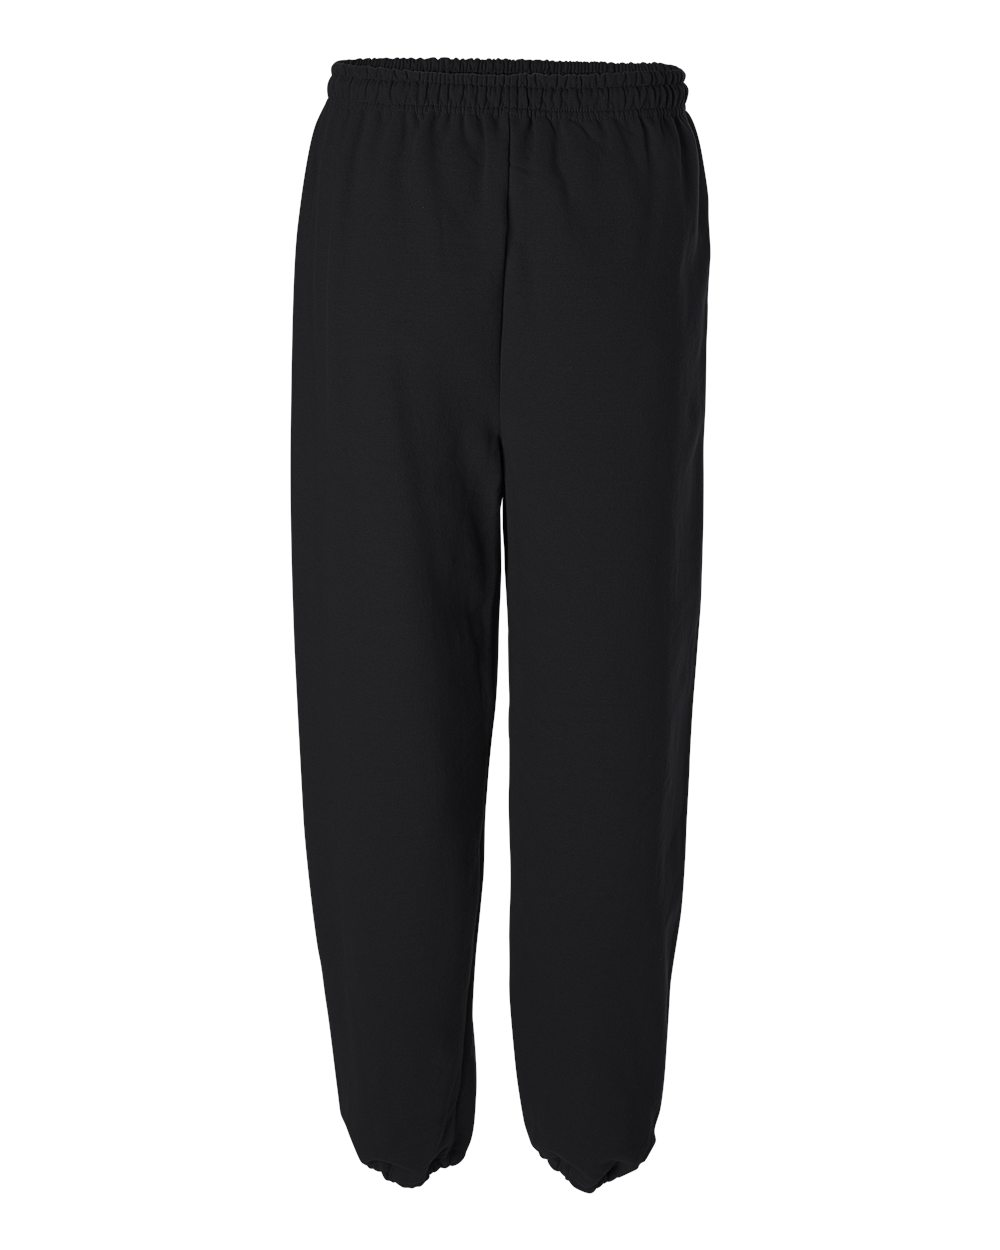 Gildan-Mens-Heavy-Blend-Sweatpants-18200-up-to-2XL thumbnail 10